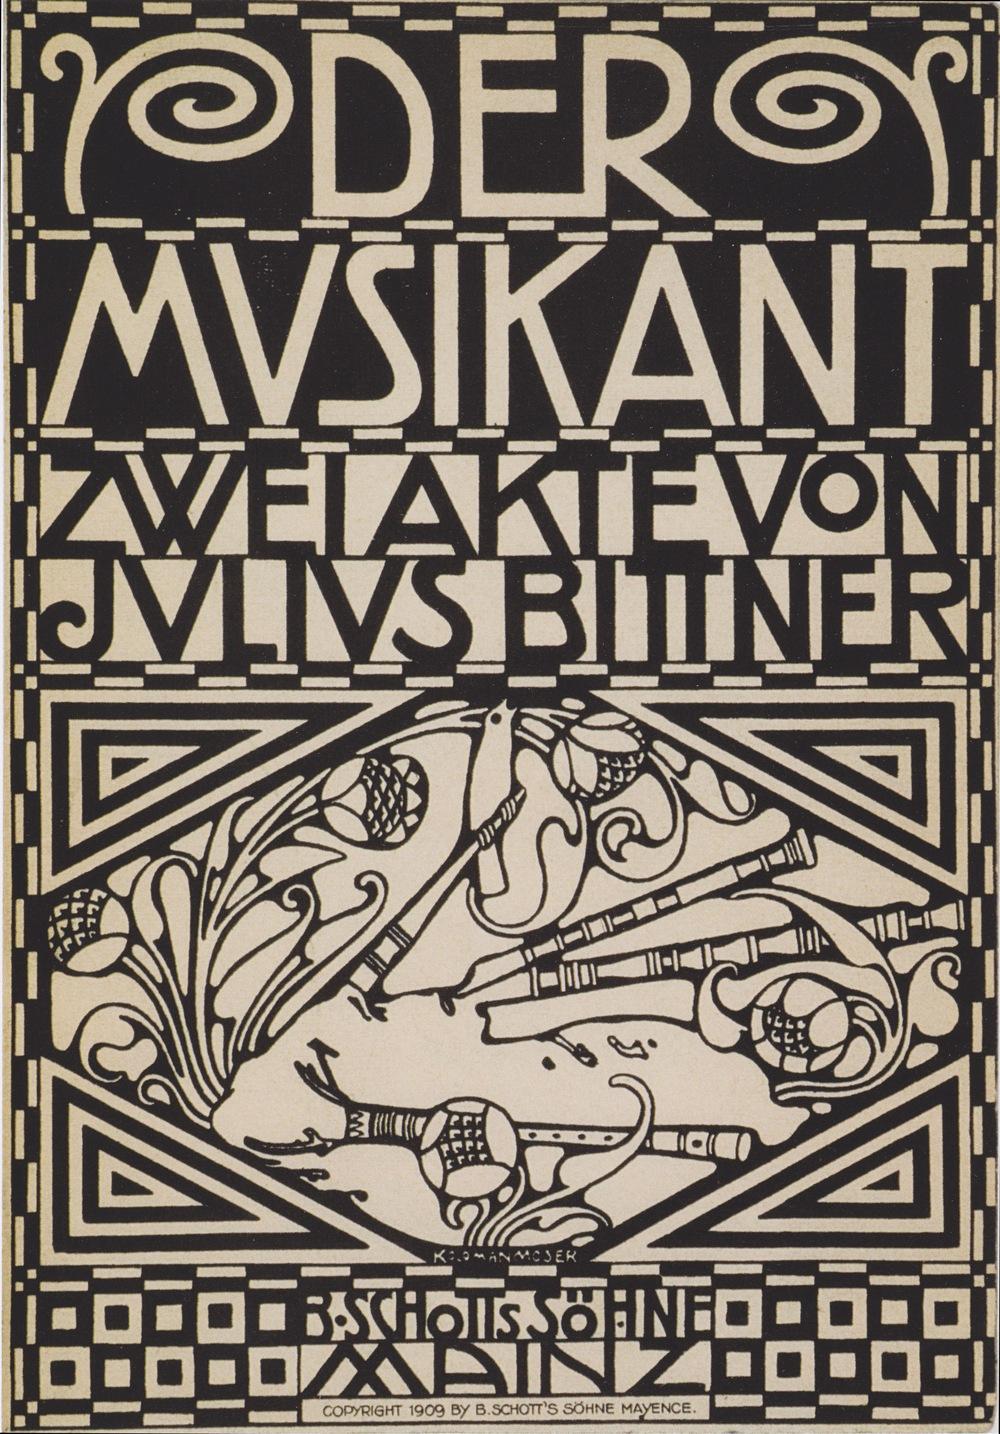 Kolo_Moser_-_Der_Musikant_-_1909.jpeg